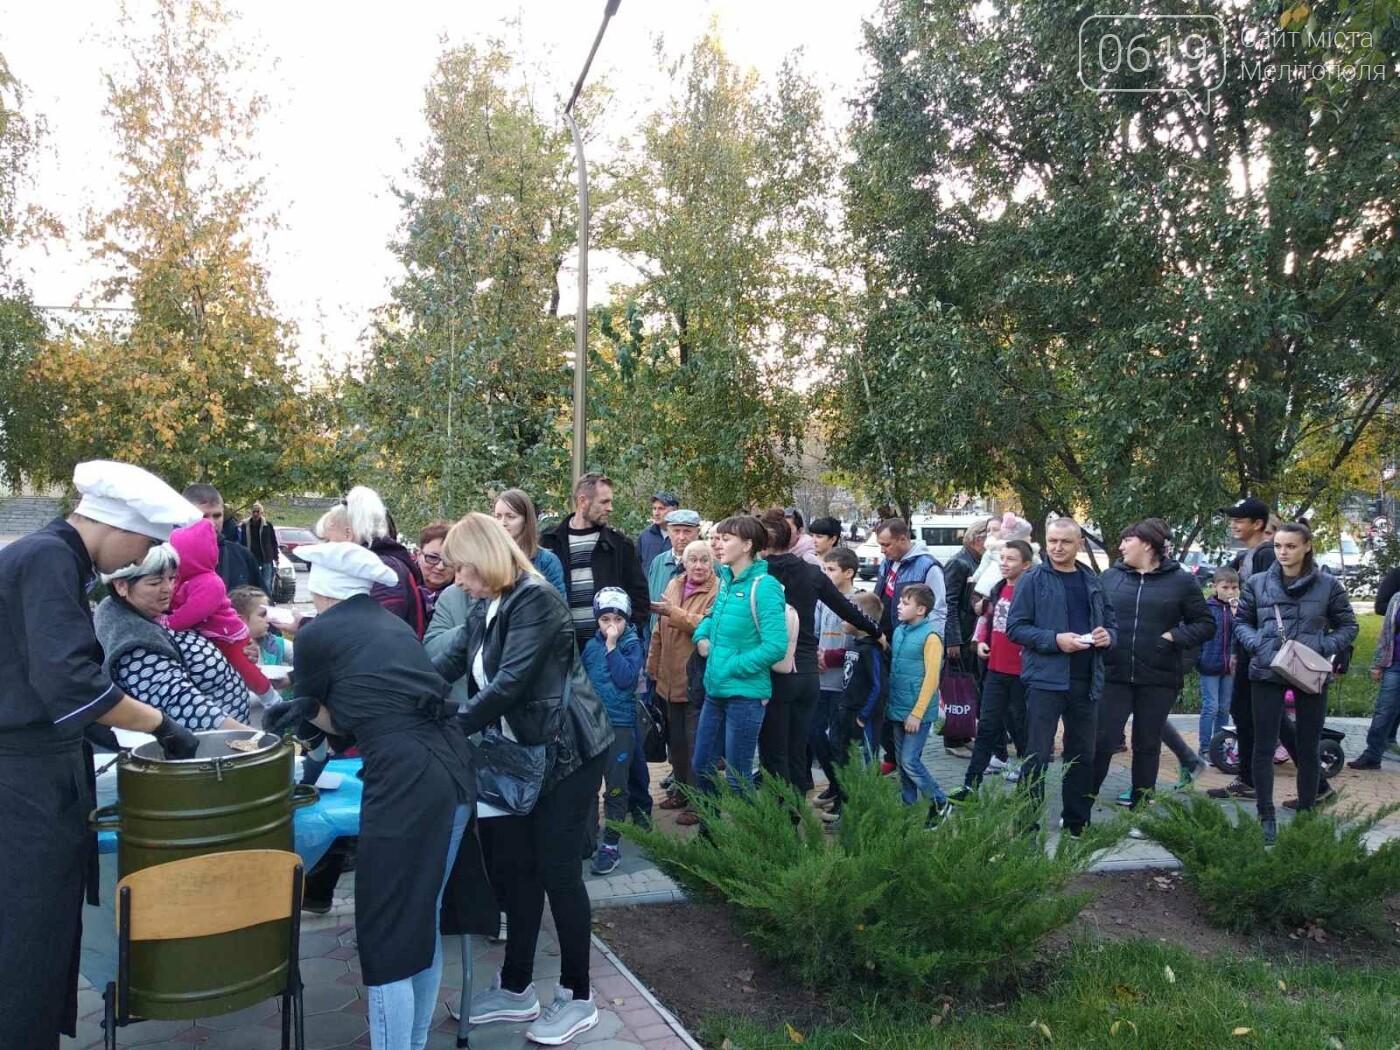 Жители микрорайона отметили День освобождения Мелитополя, - ФОТО , фото-9